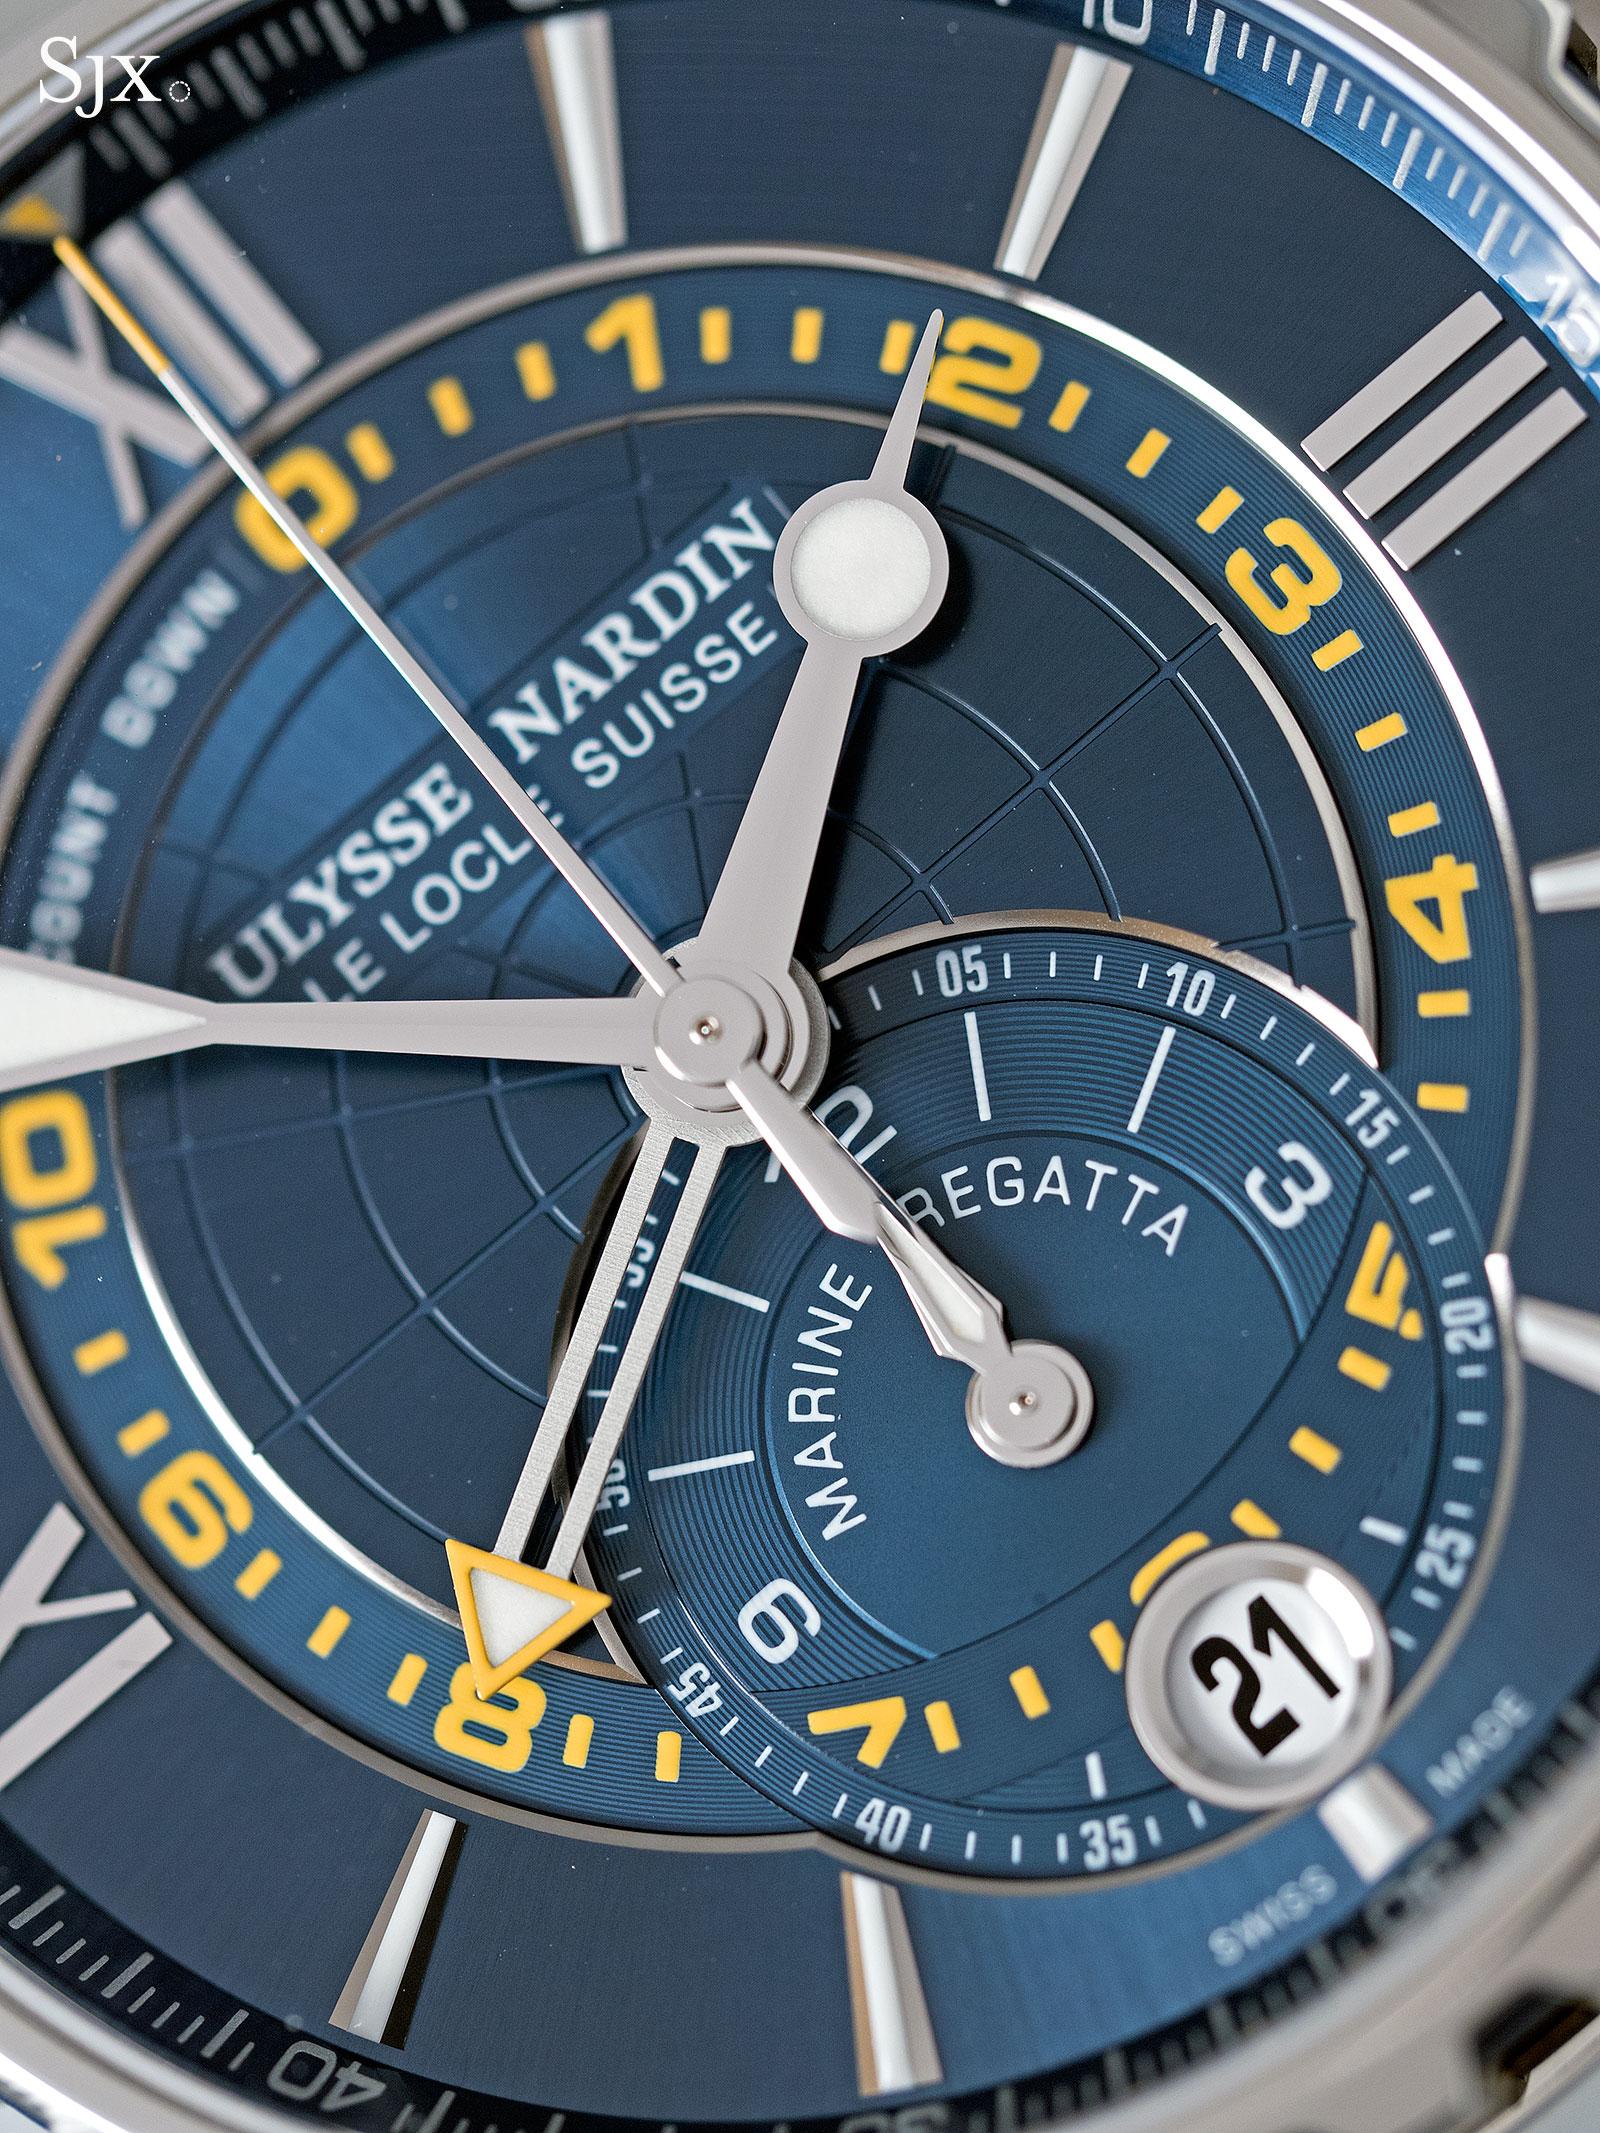 Ulysse Nardin Marine Chronograph Manufacture Regatta 2